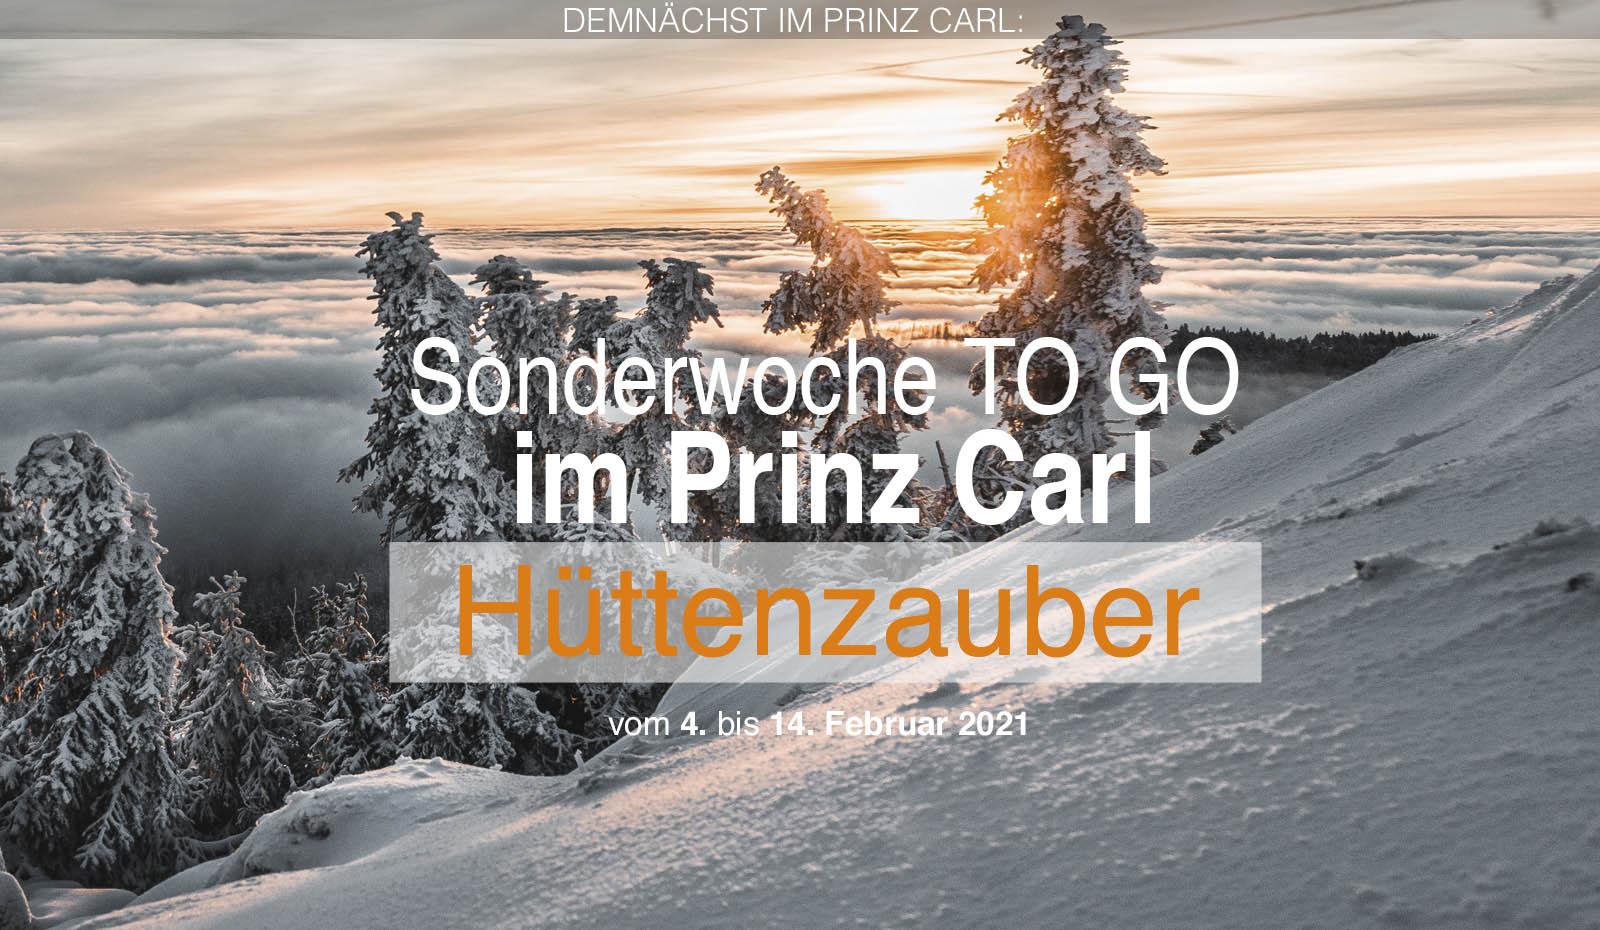 huttenzauber_demnaechst_opt